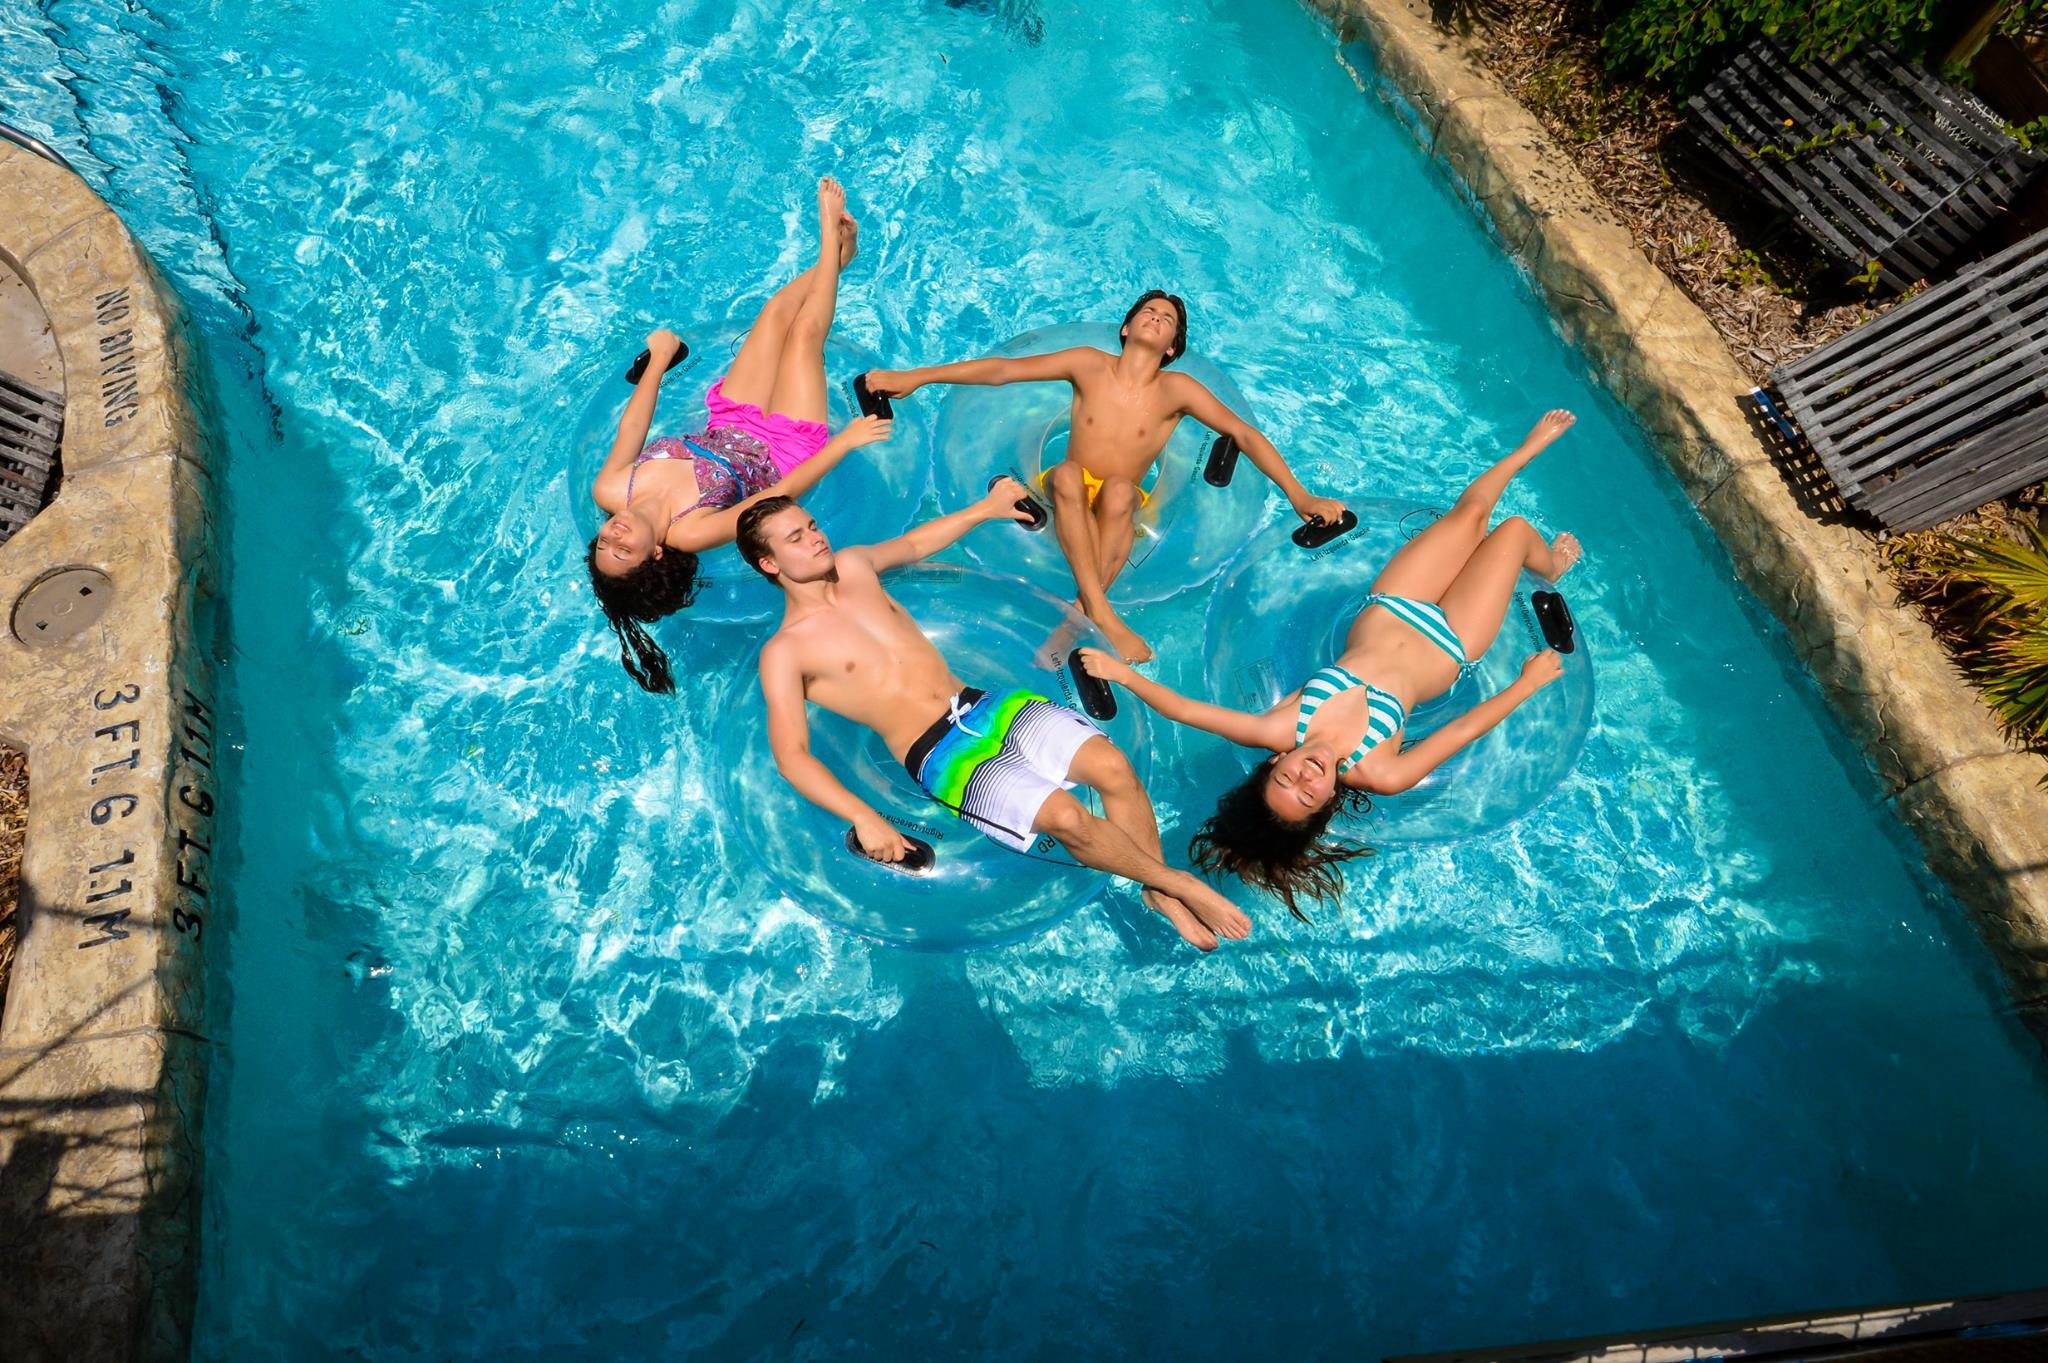 Wet'n'Wild Hawaii Water Park Excursion - Standard Package